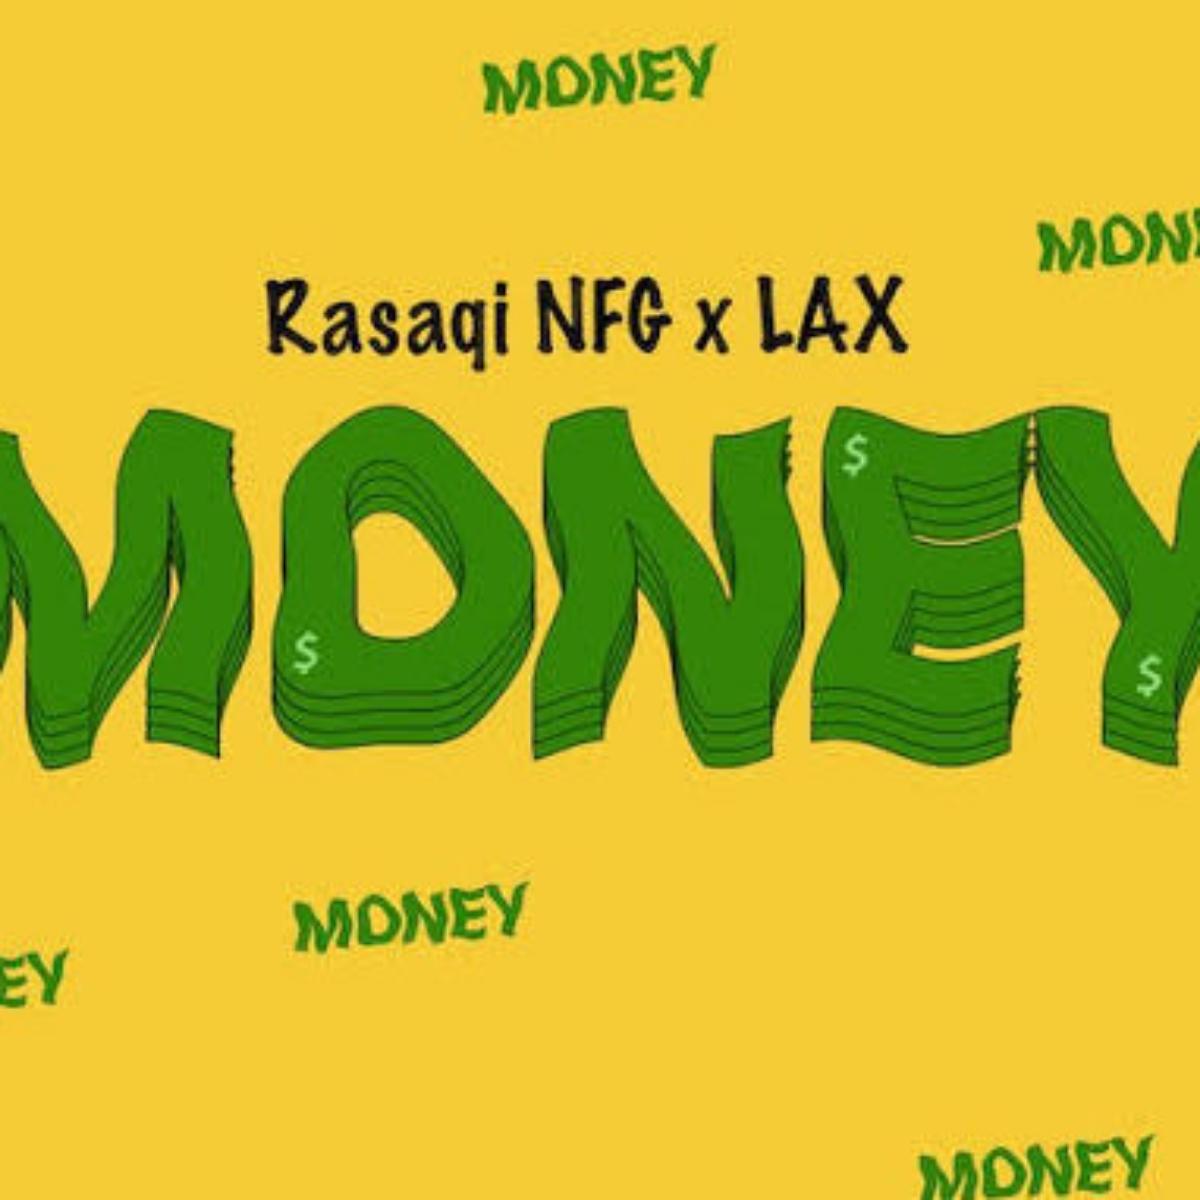 Rasaqi NFG x L.A.X – Money mp3 download